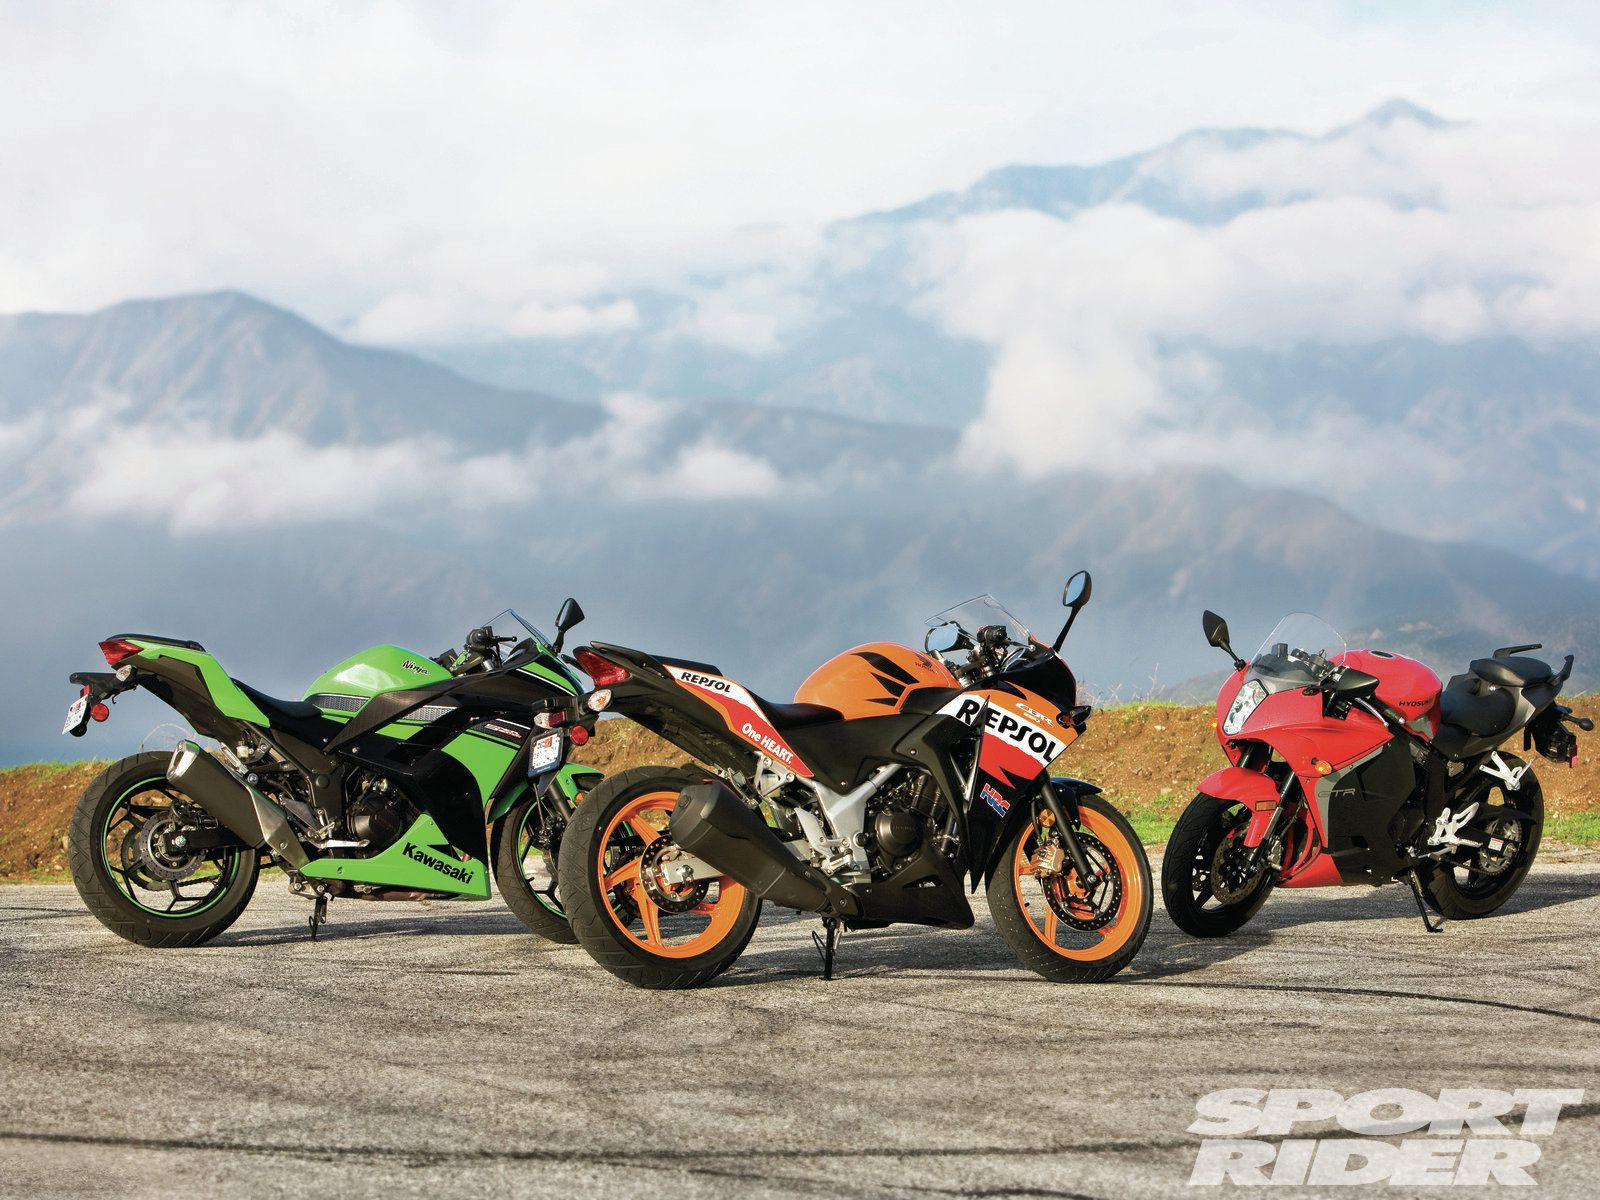 Lightweight Sportbike Comparison Test | Cycle World